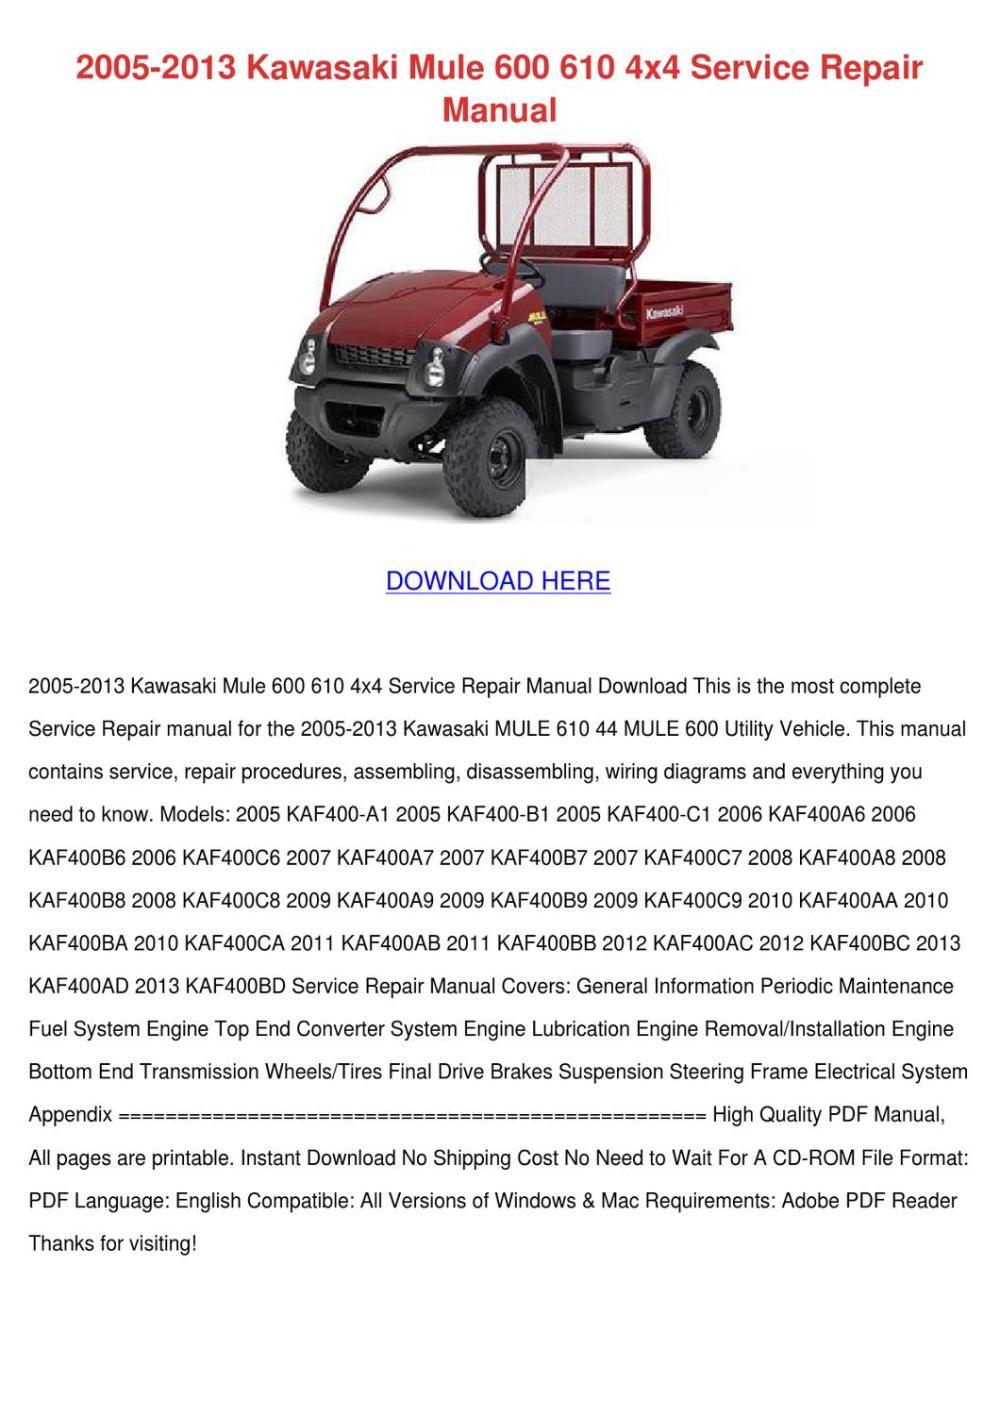 medium resolution of 2005 2013 kawasaki mule 600 610 4x4 service r by sammyrosenbaum issuukawasaki mule 600 wiring diagram